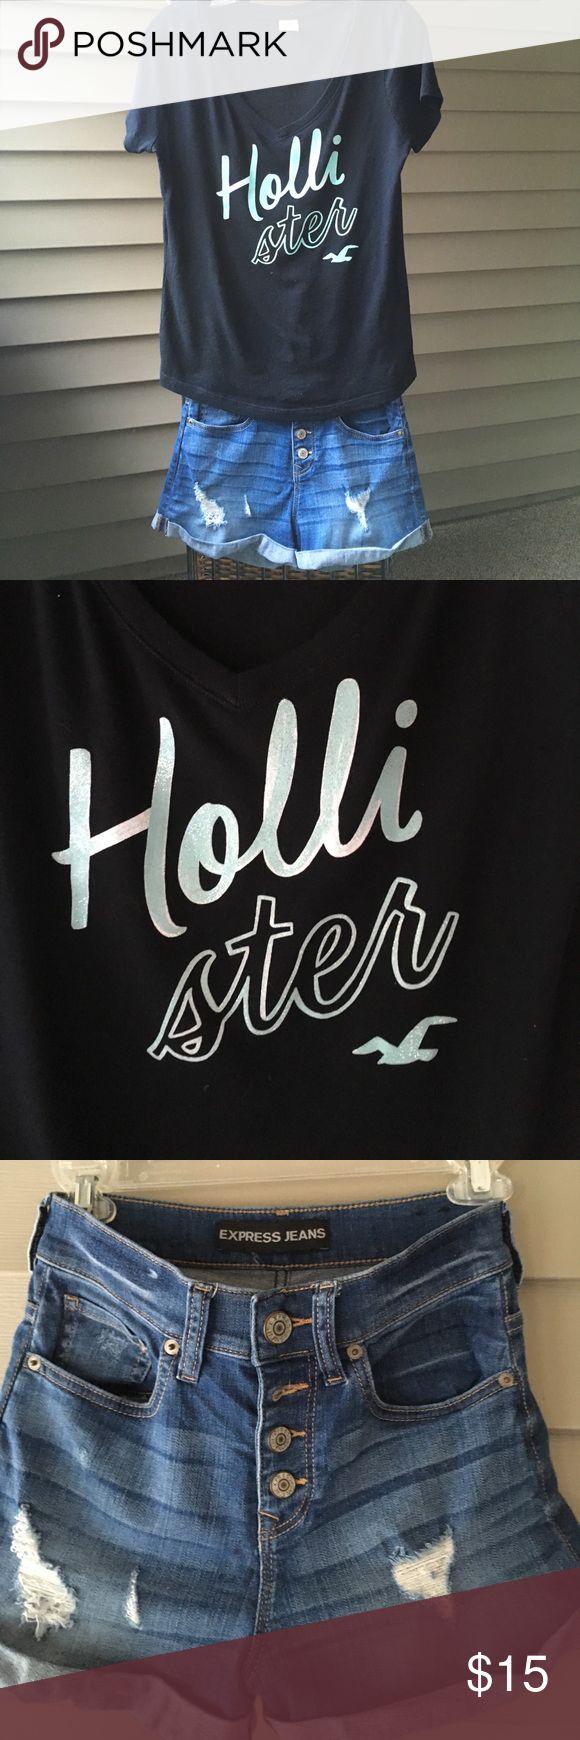 Hollister Tee & Express Jeans Button Short Shorts Hollister mint screenprint on black v Neck tee size small.                       Express Jeans size 00 Denim Short Shorts with button fly Hollister Tops Tees - Short Sleeve